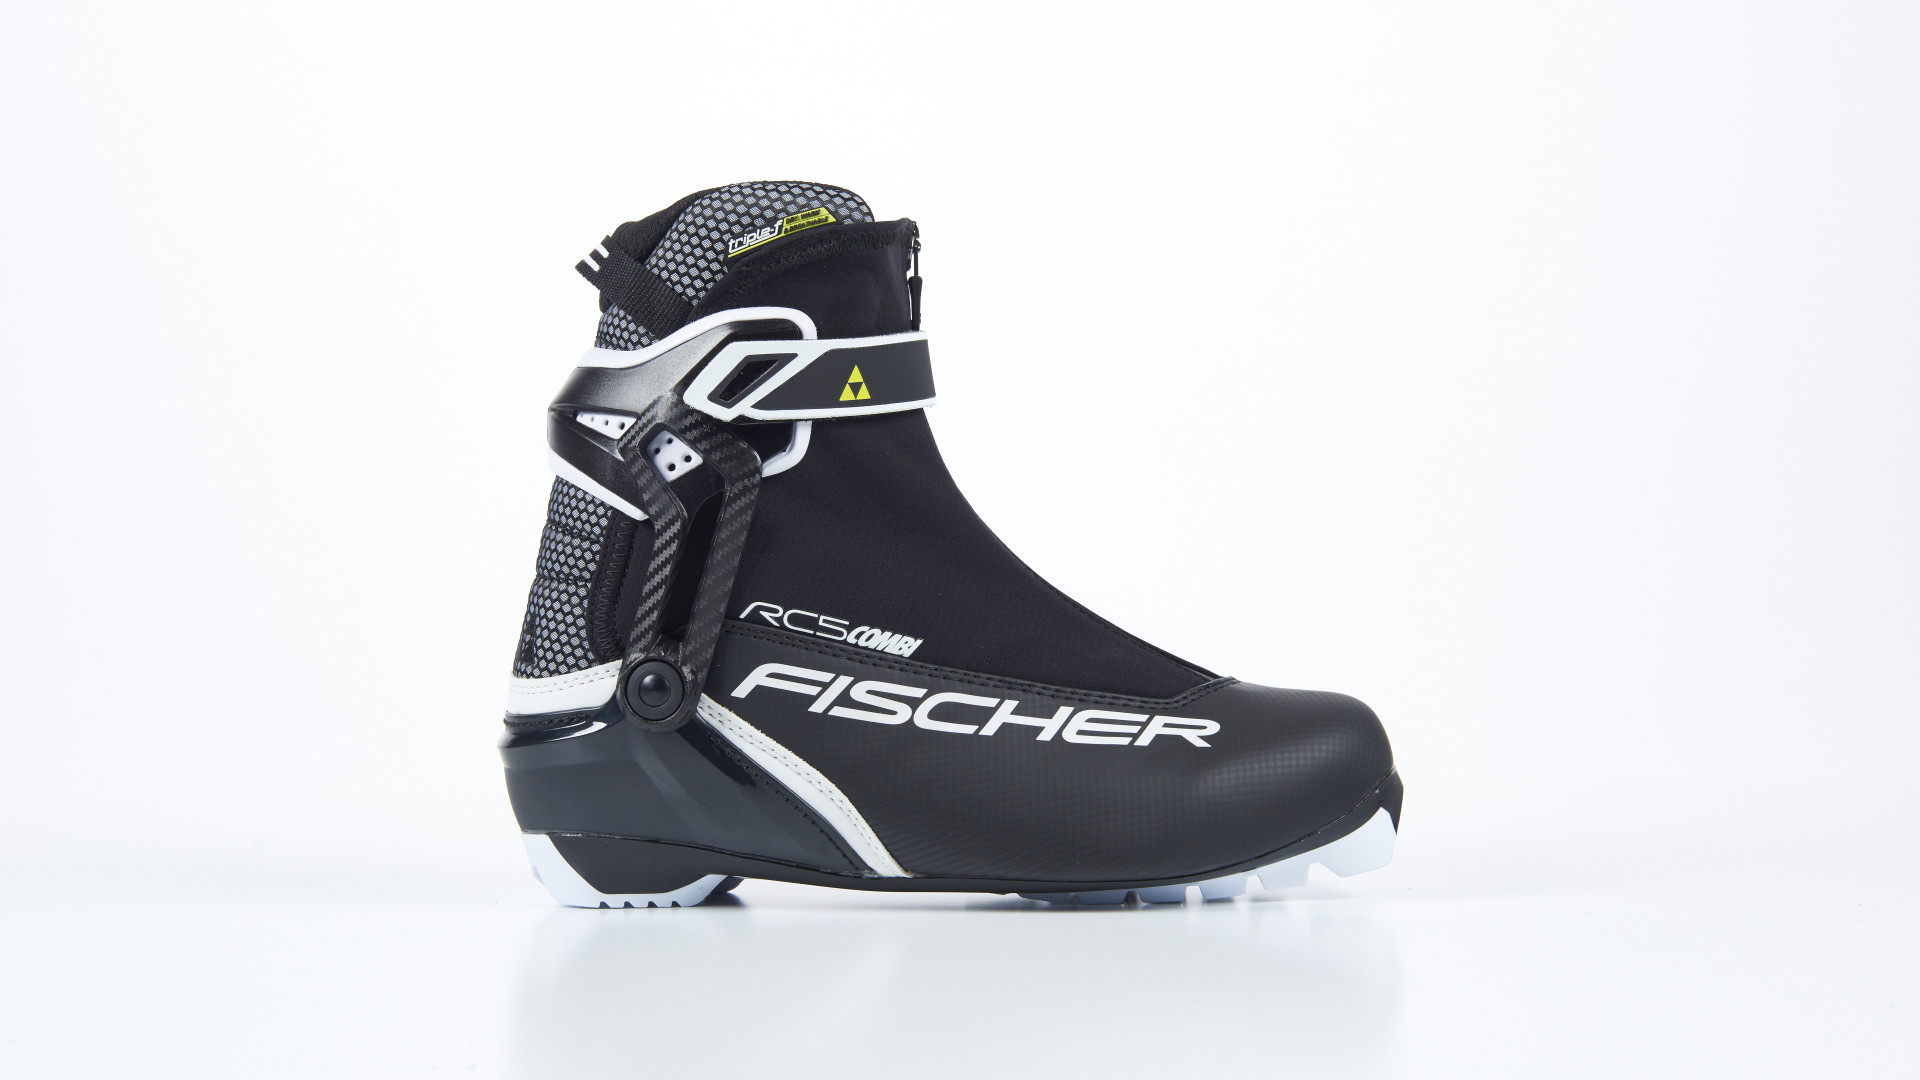 Ski/Langlaufschuhe RC5 Combi